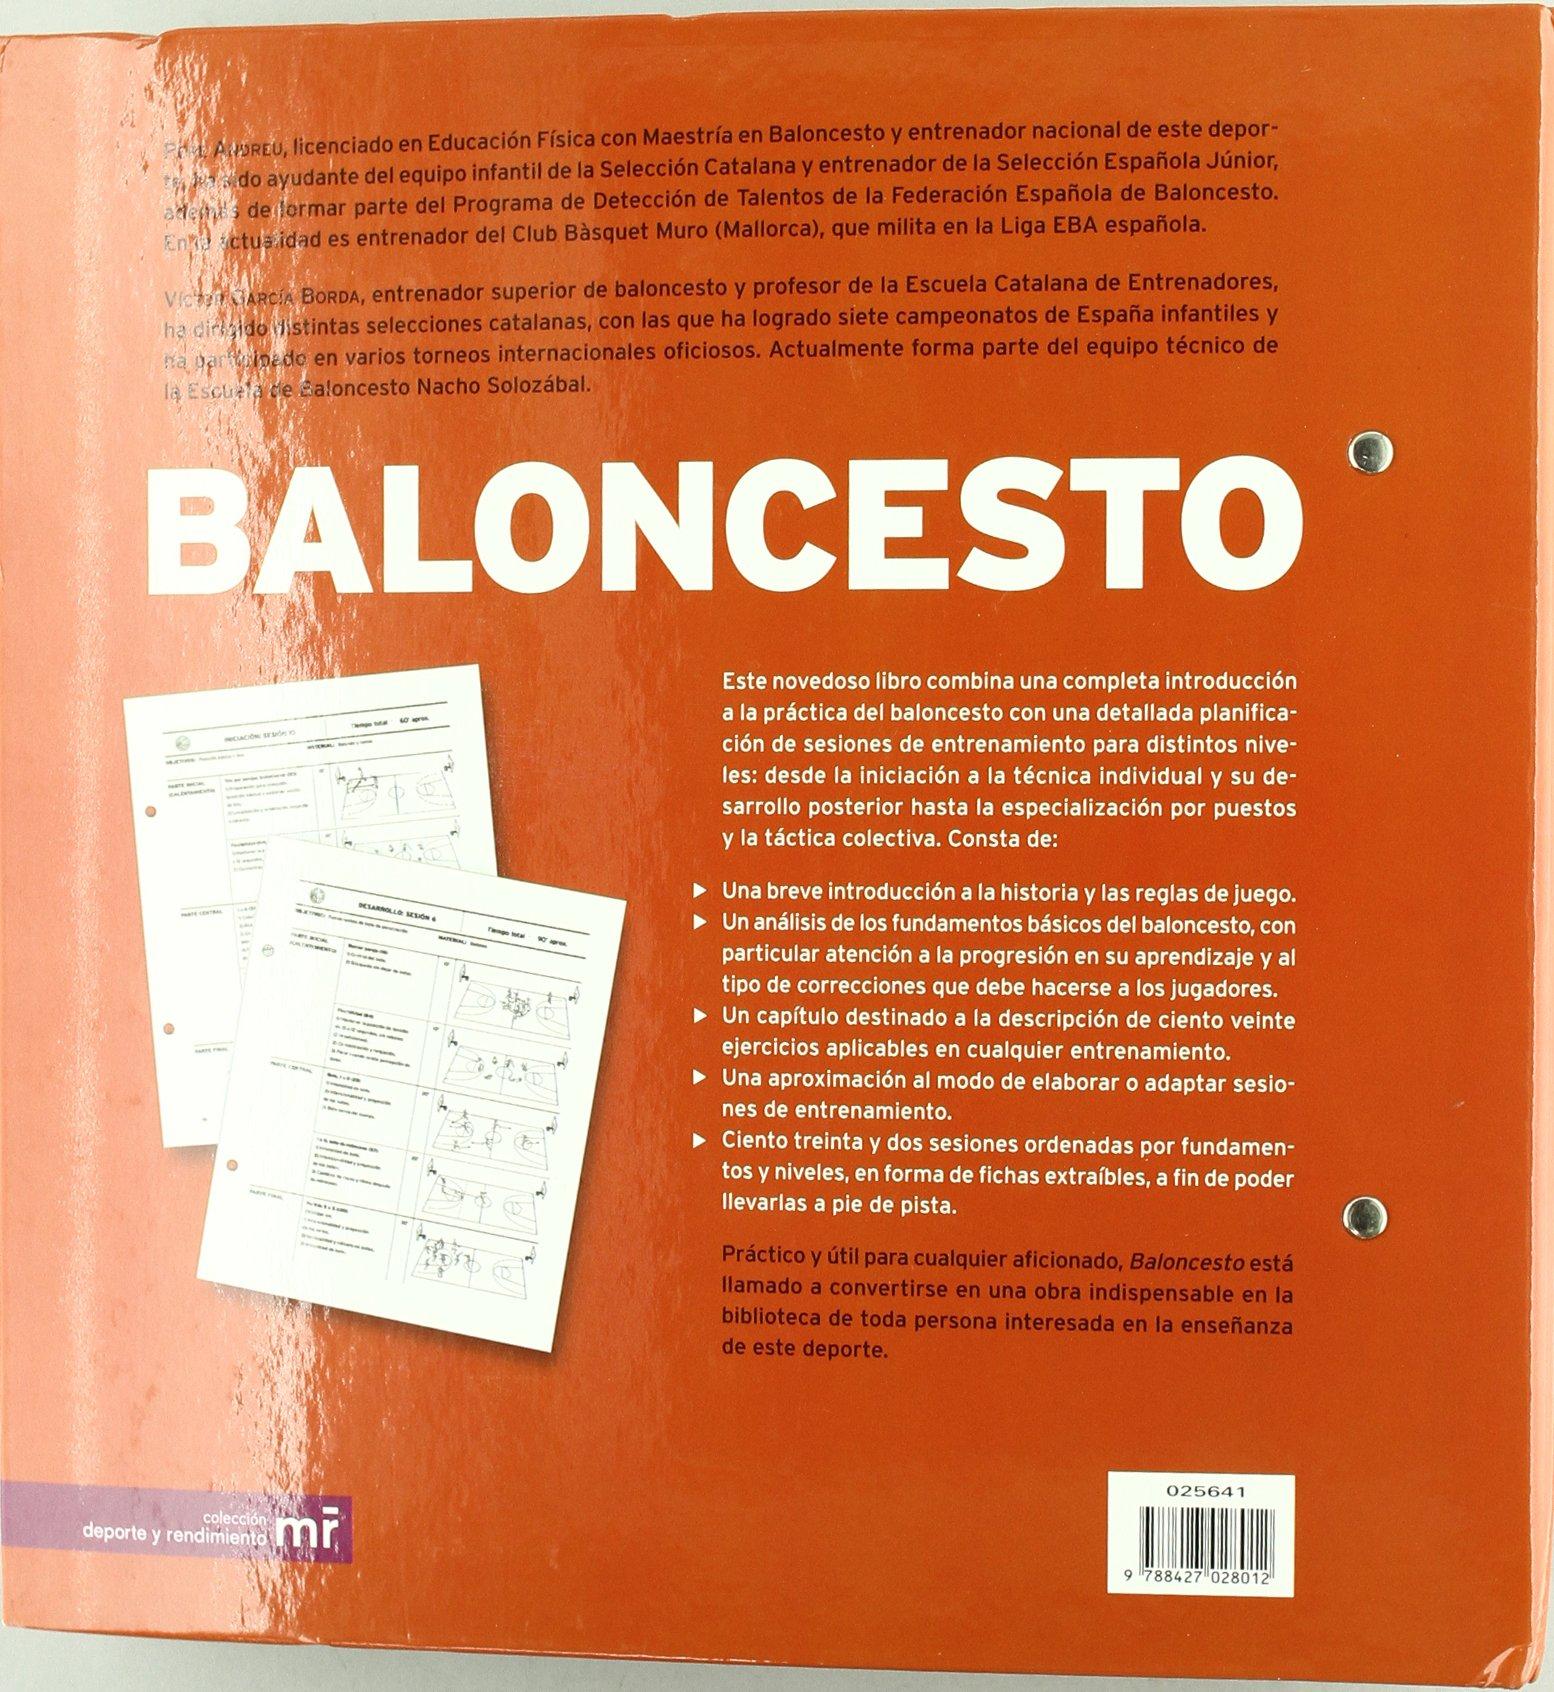 Amazon.com: Baloncesto (Spanish Edition) (9788427028012 ...